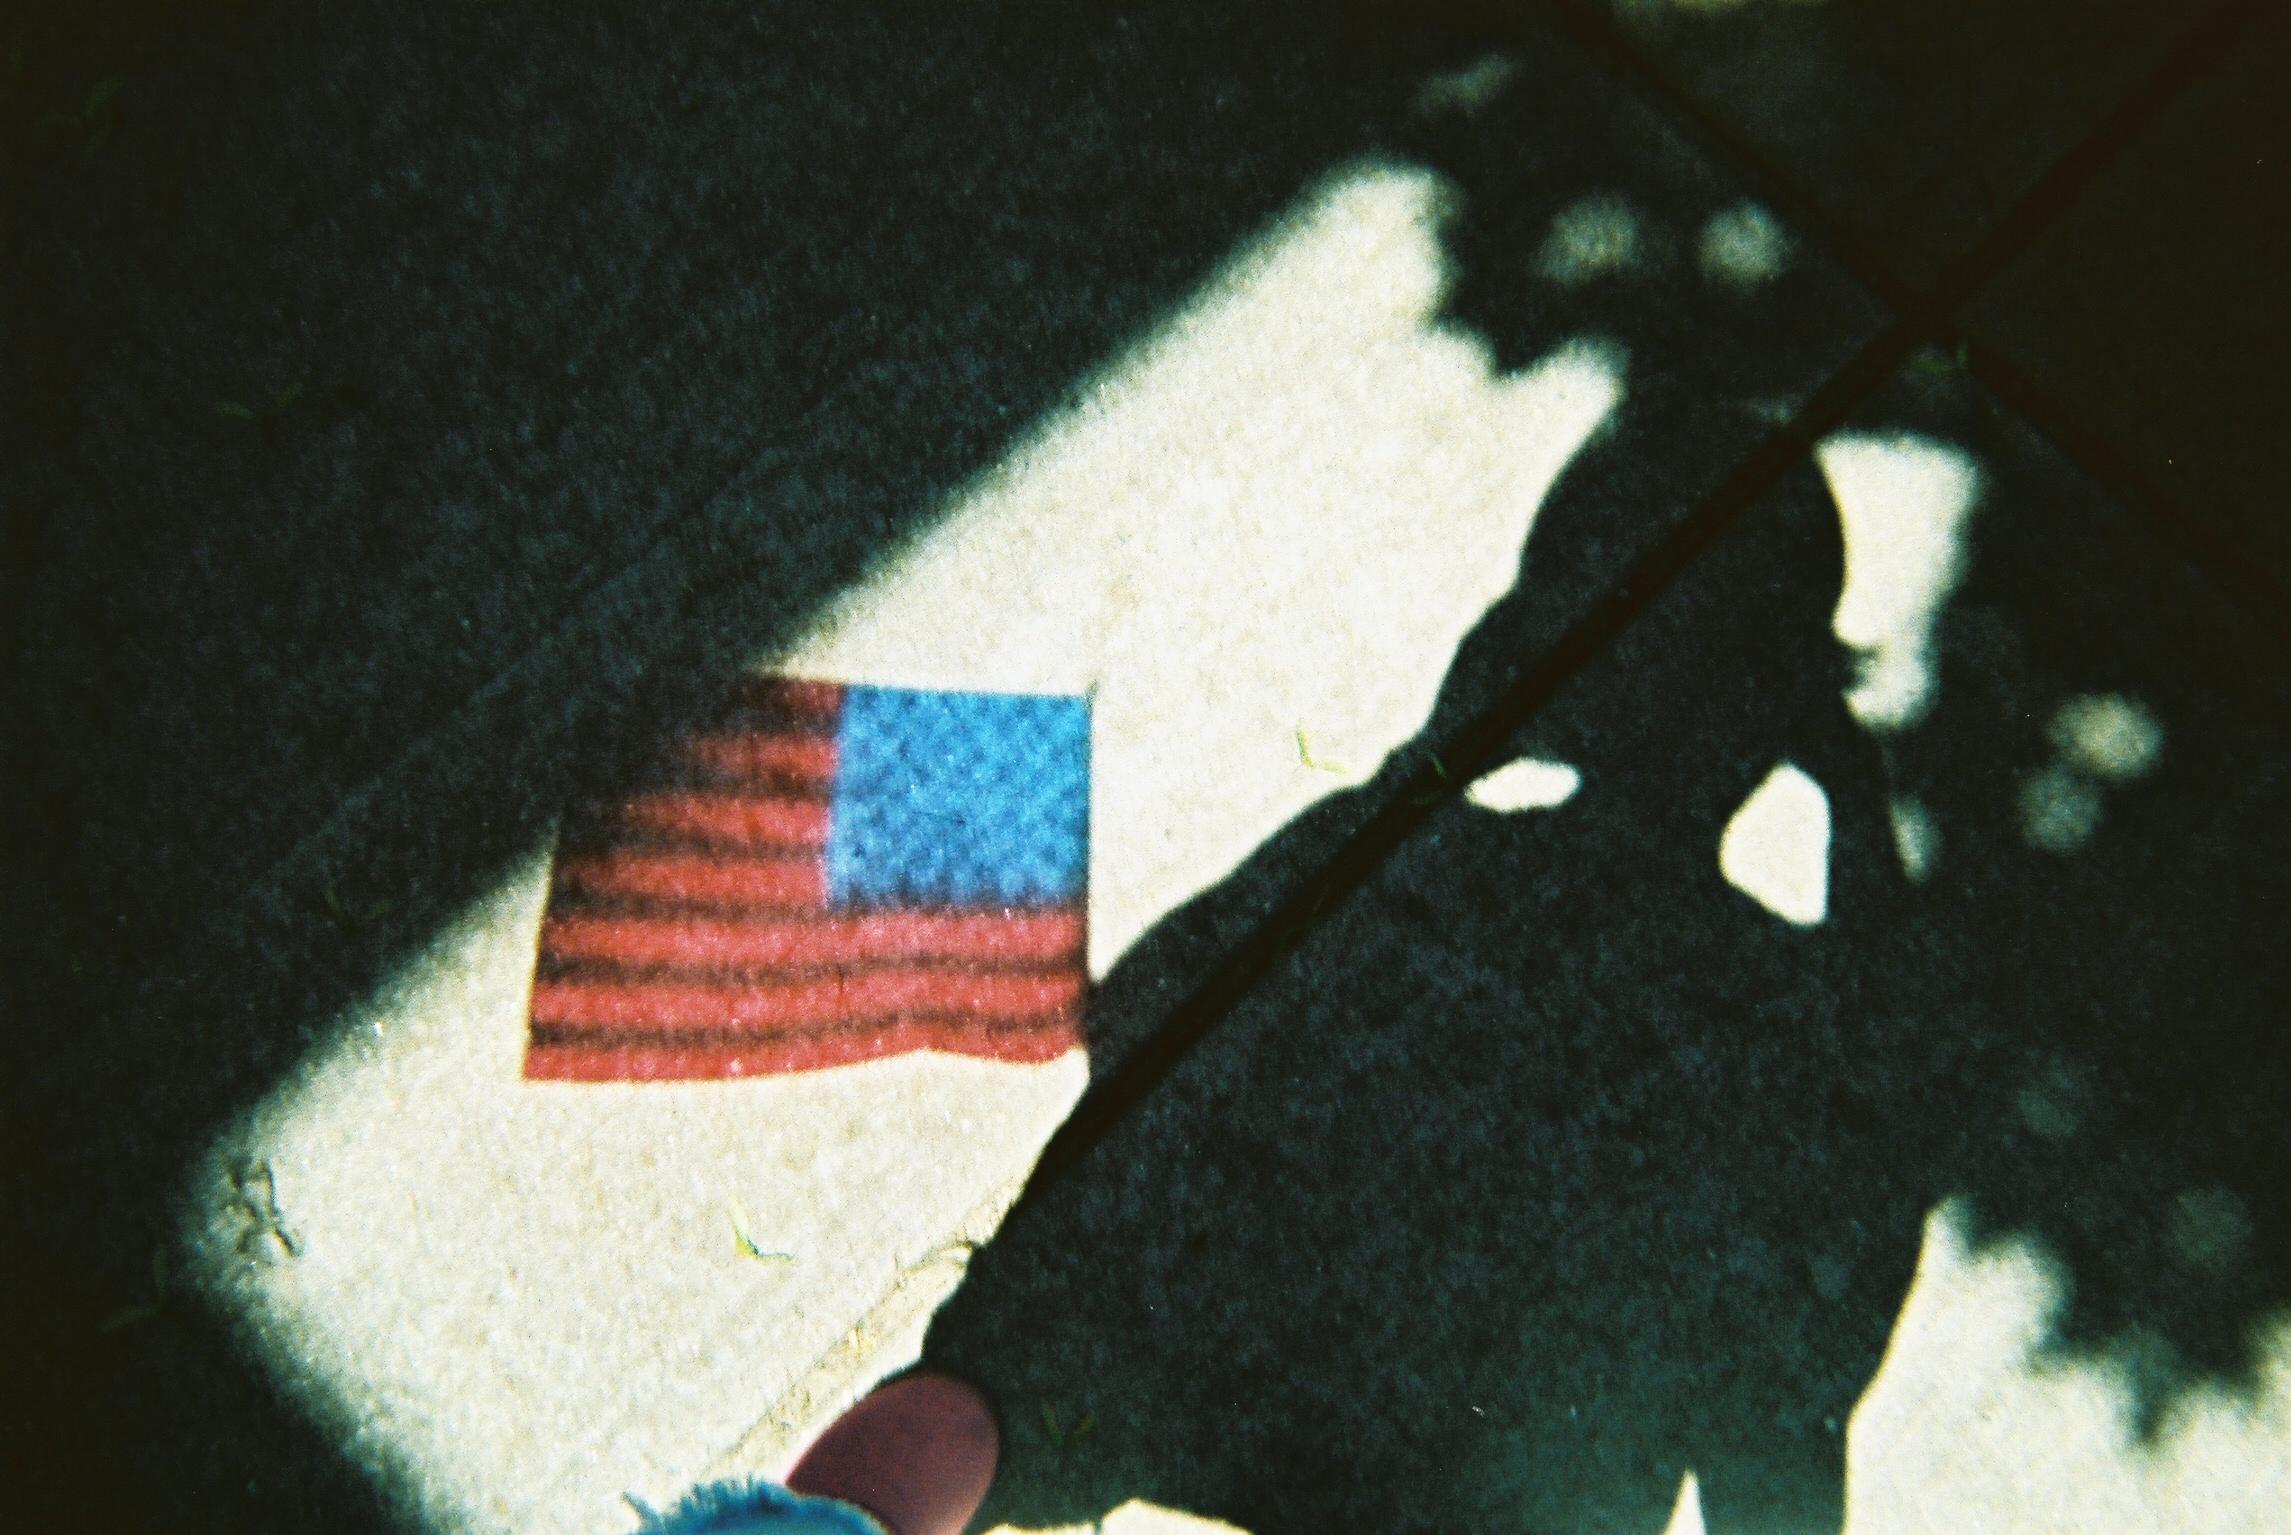 MIXTAPE: Greg Vandy's Post-Modern Americana